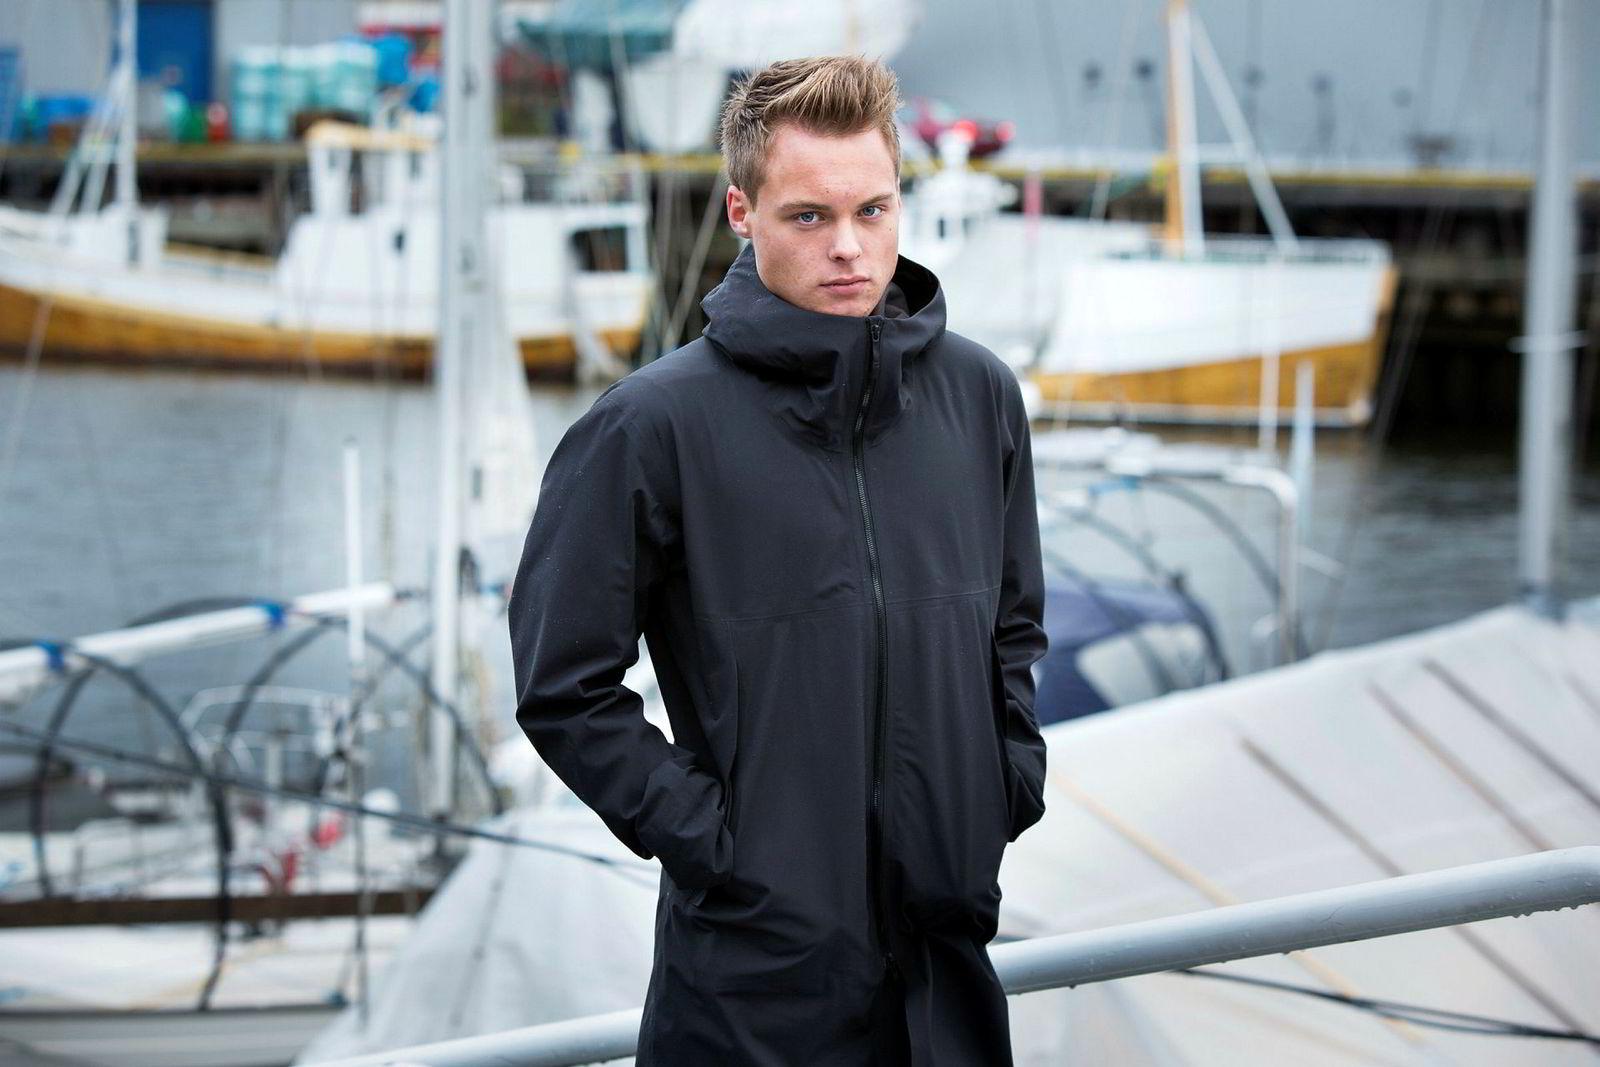 24 år gamle Gustav Magnar Witzøe fra Frøya har 11 milliarder i formue.